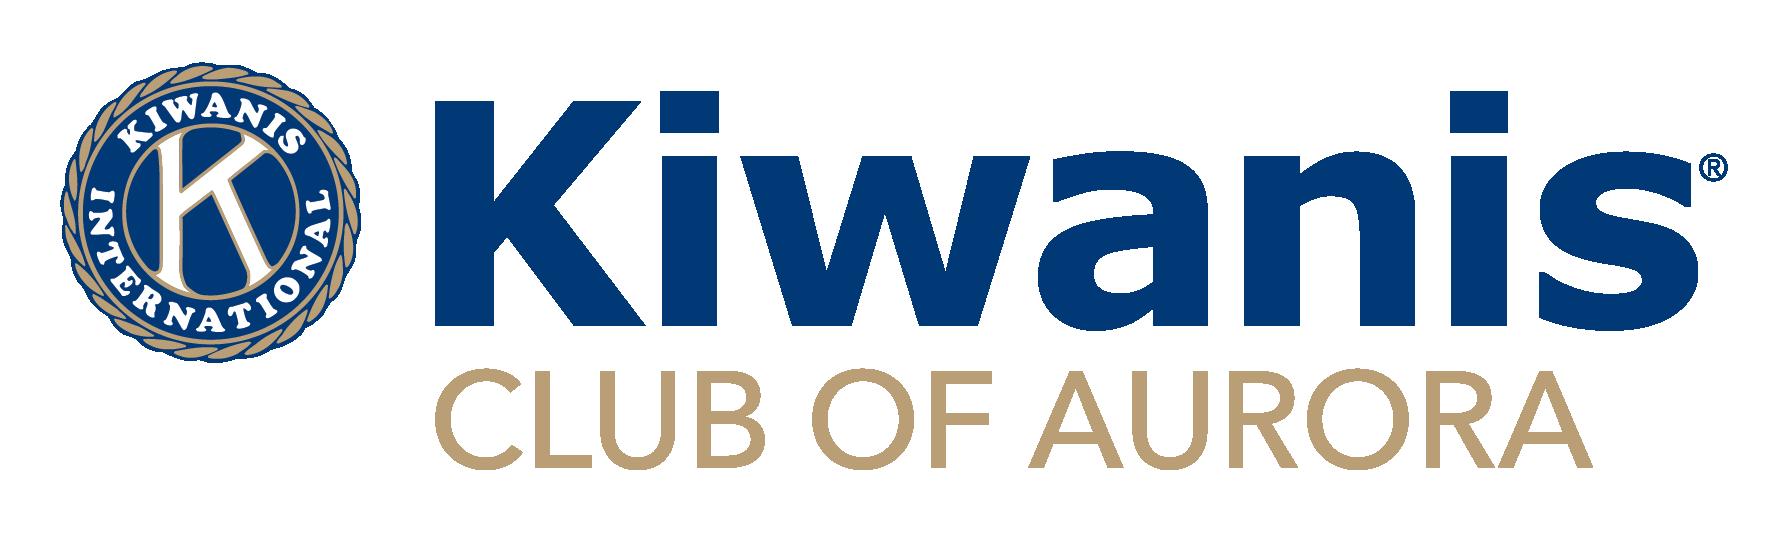 Kiwanis Club of Aurora logo